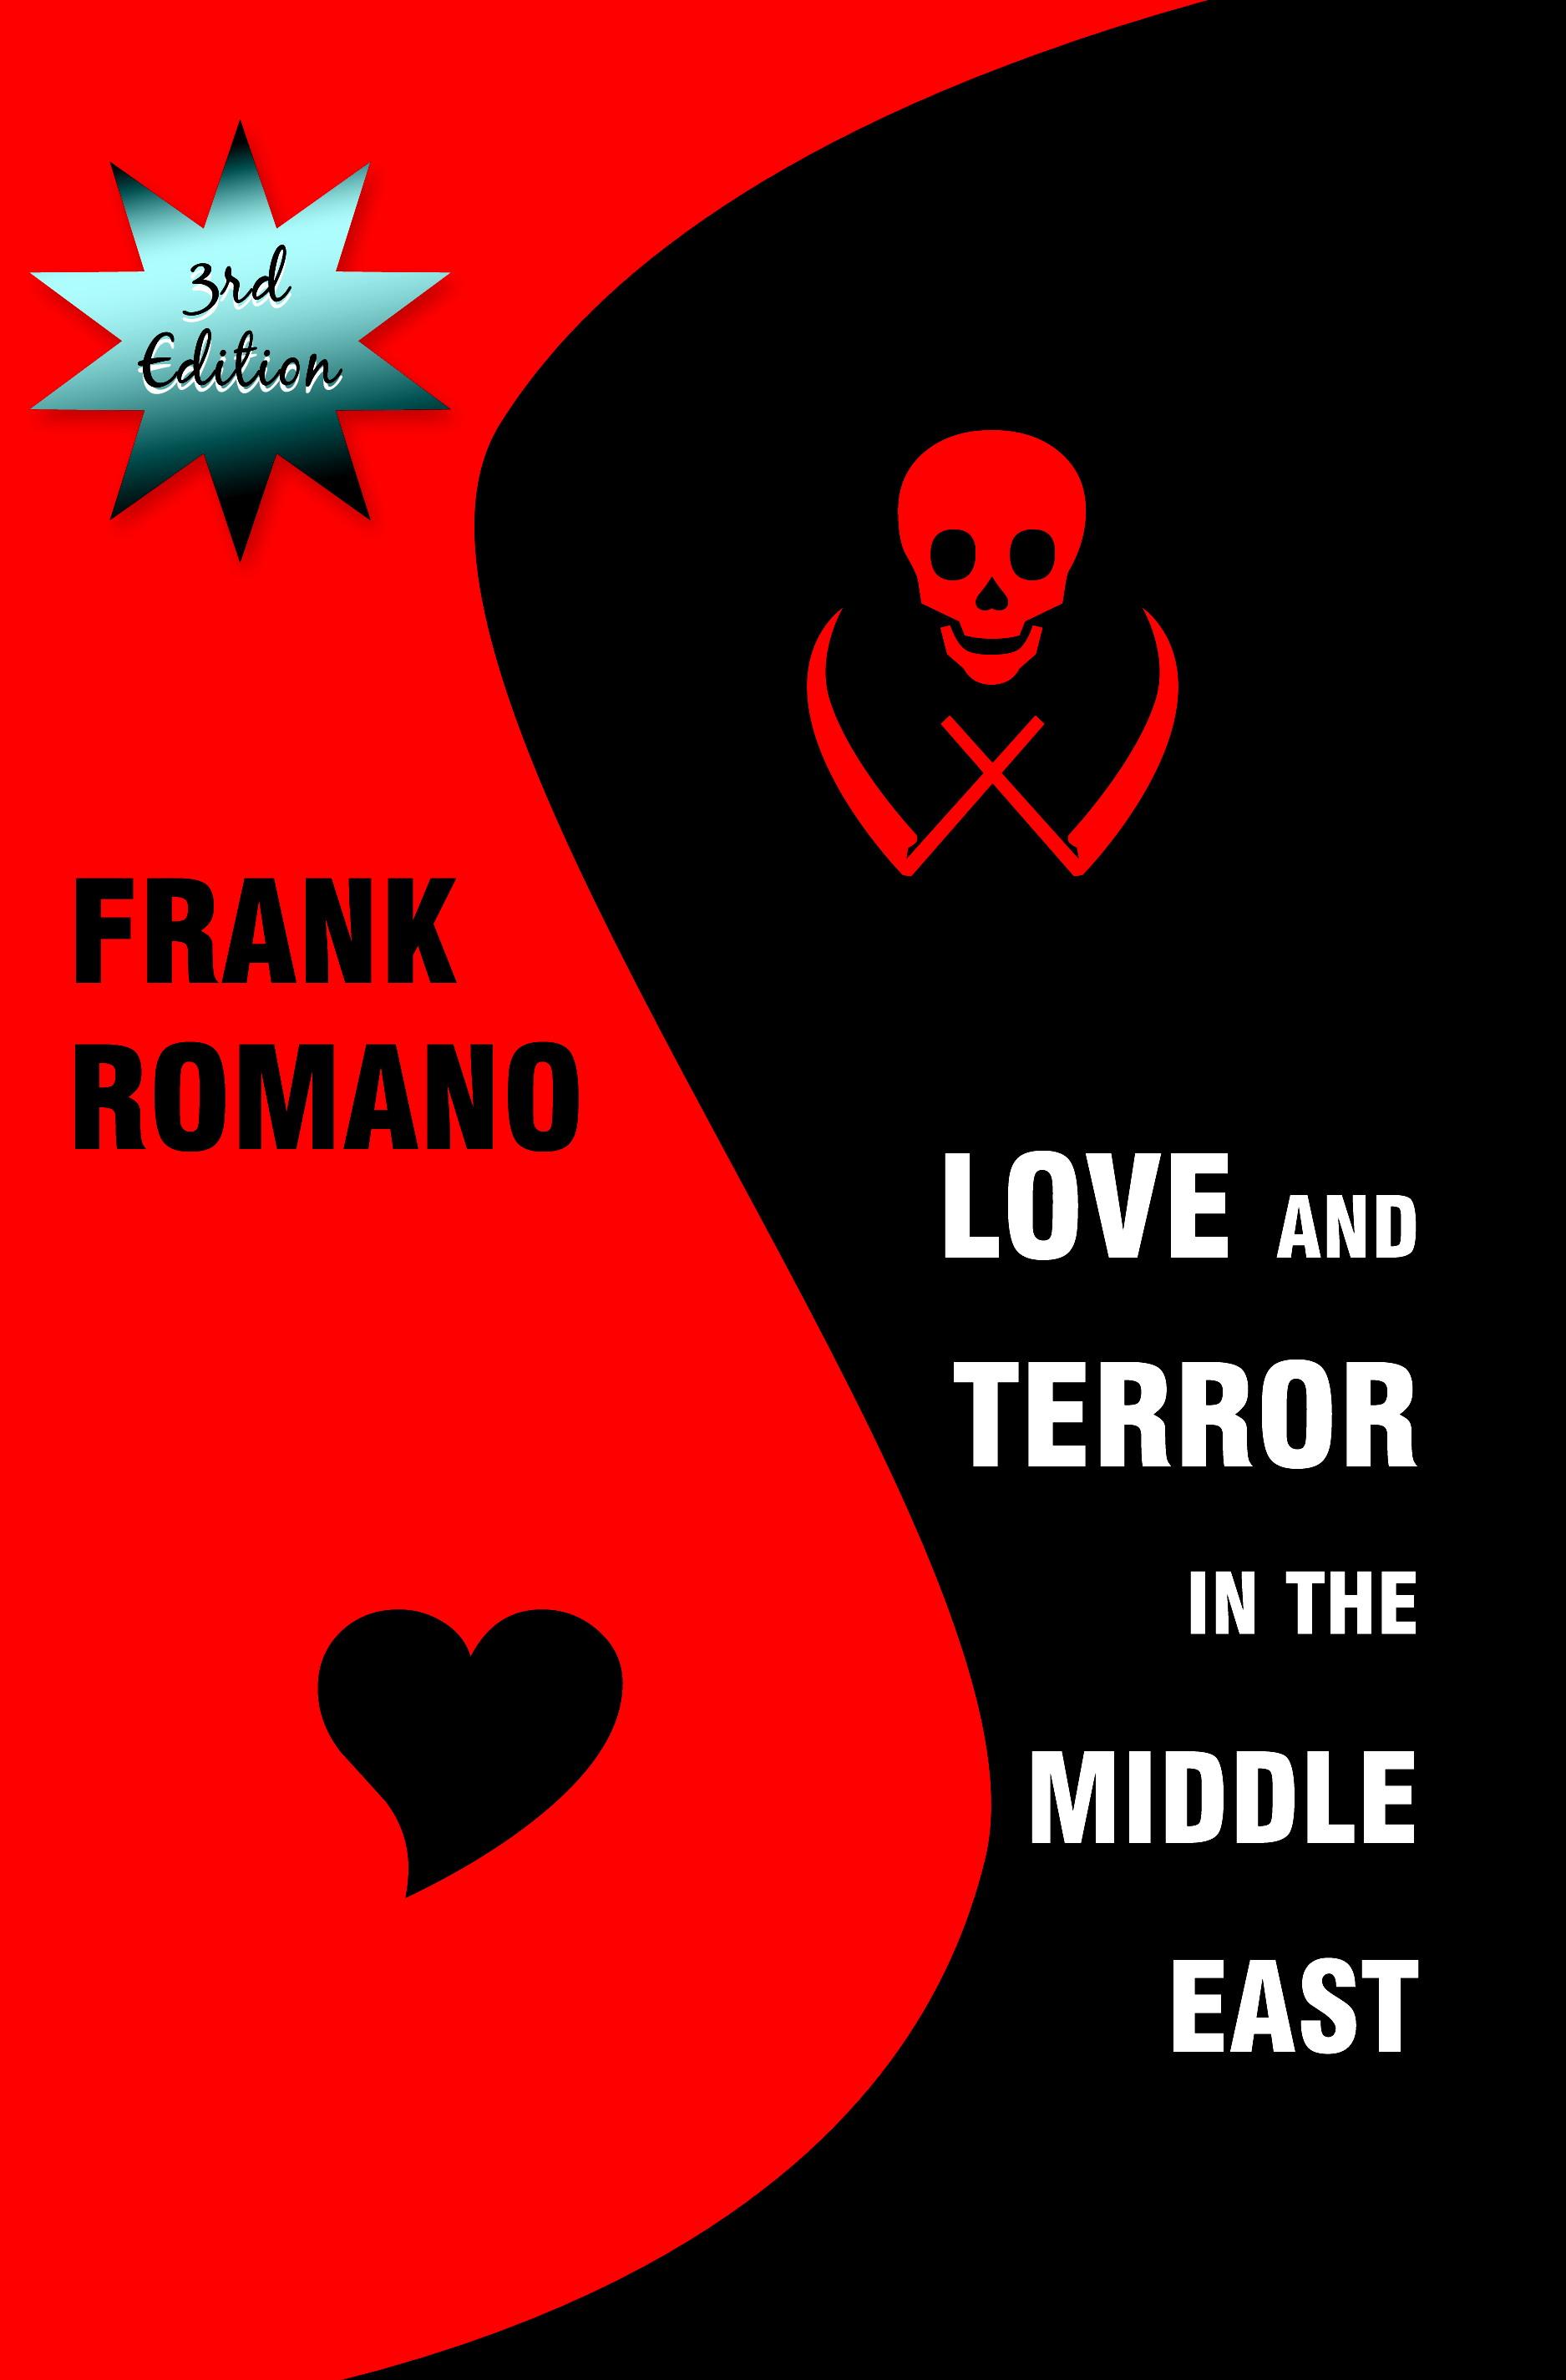 Dr. Frank Romano's book LOVE AND TERROR